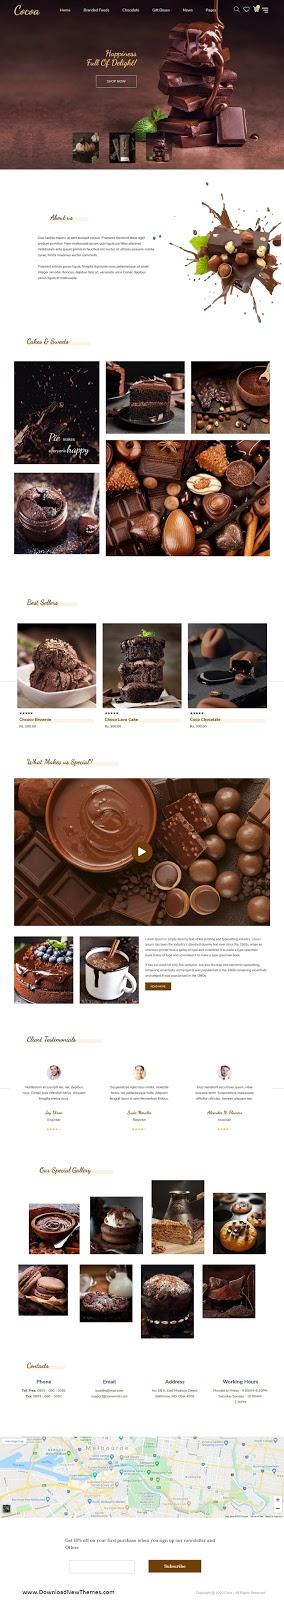 Best Chocolates Store Website Theme